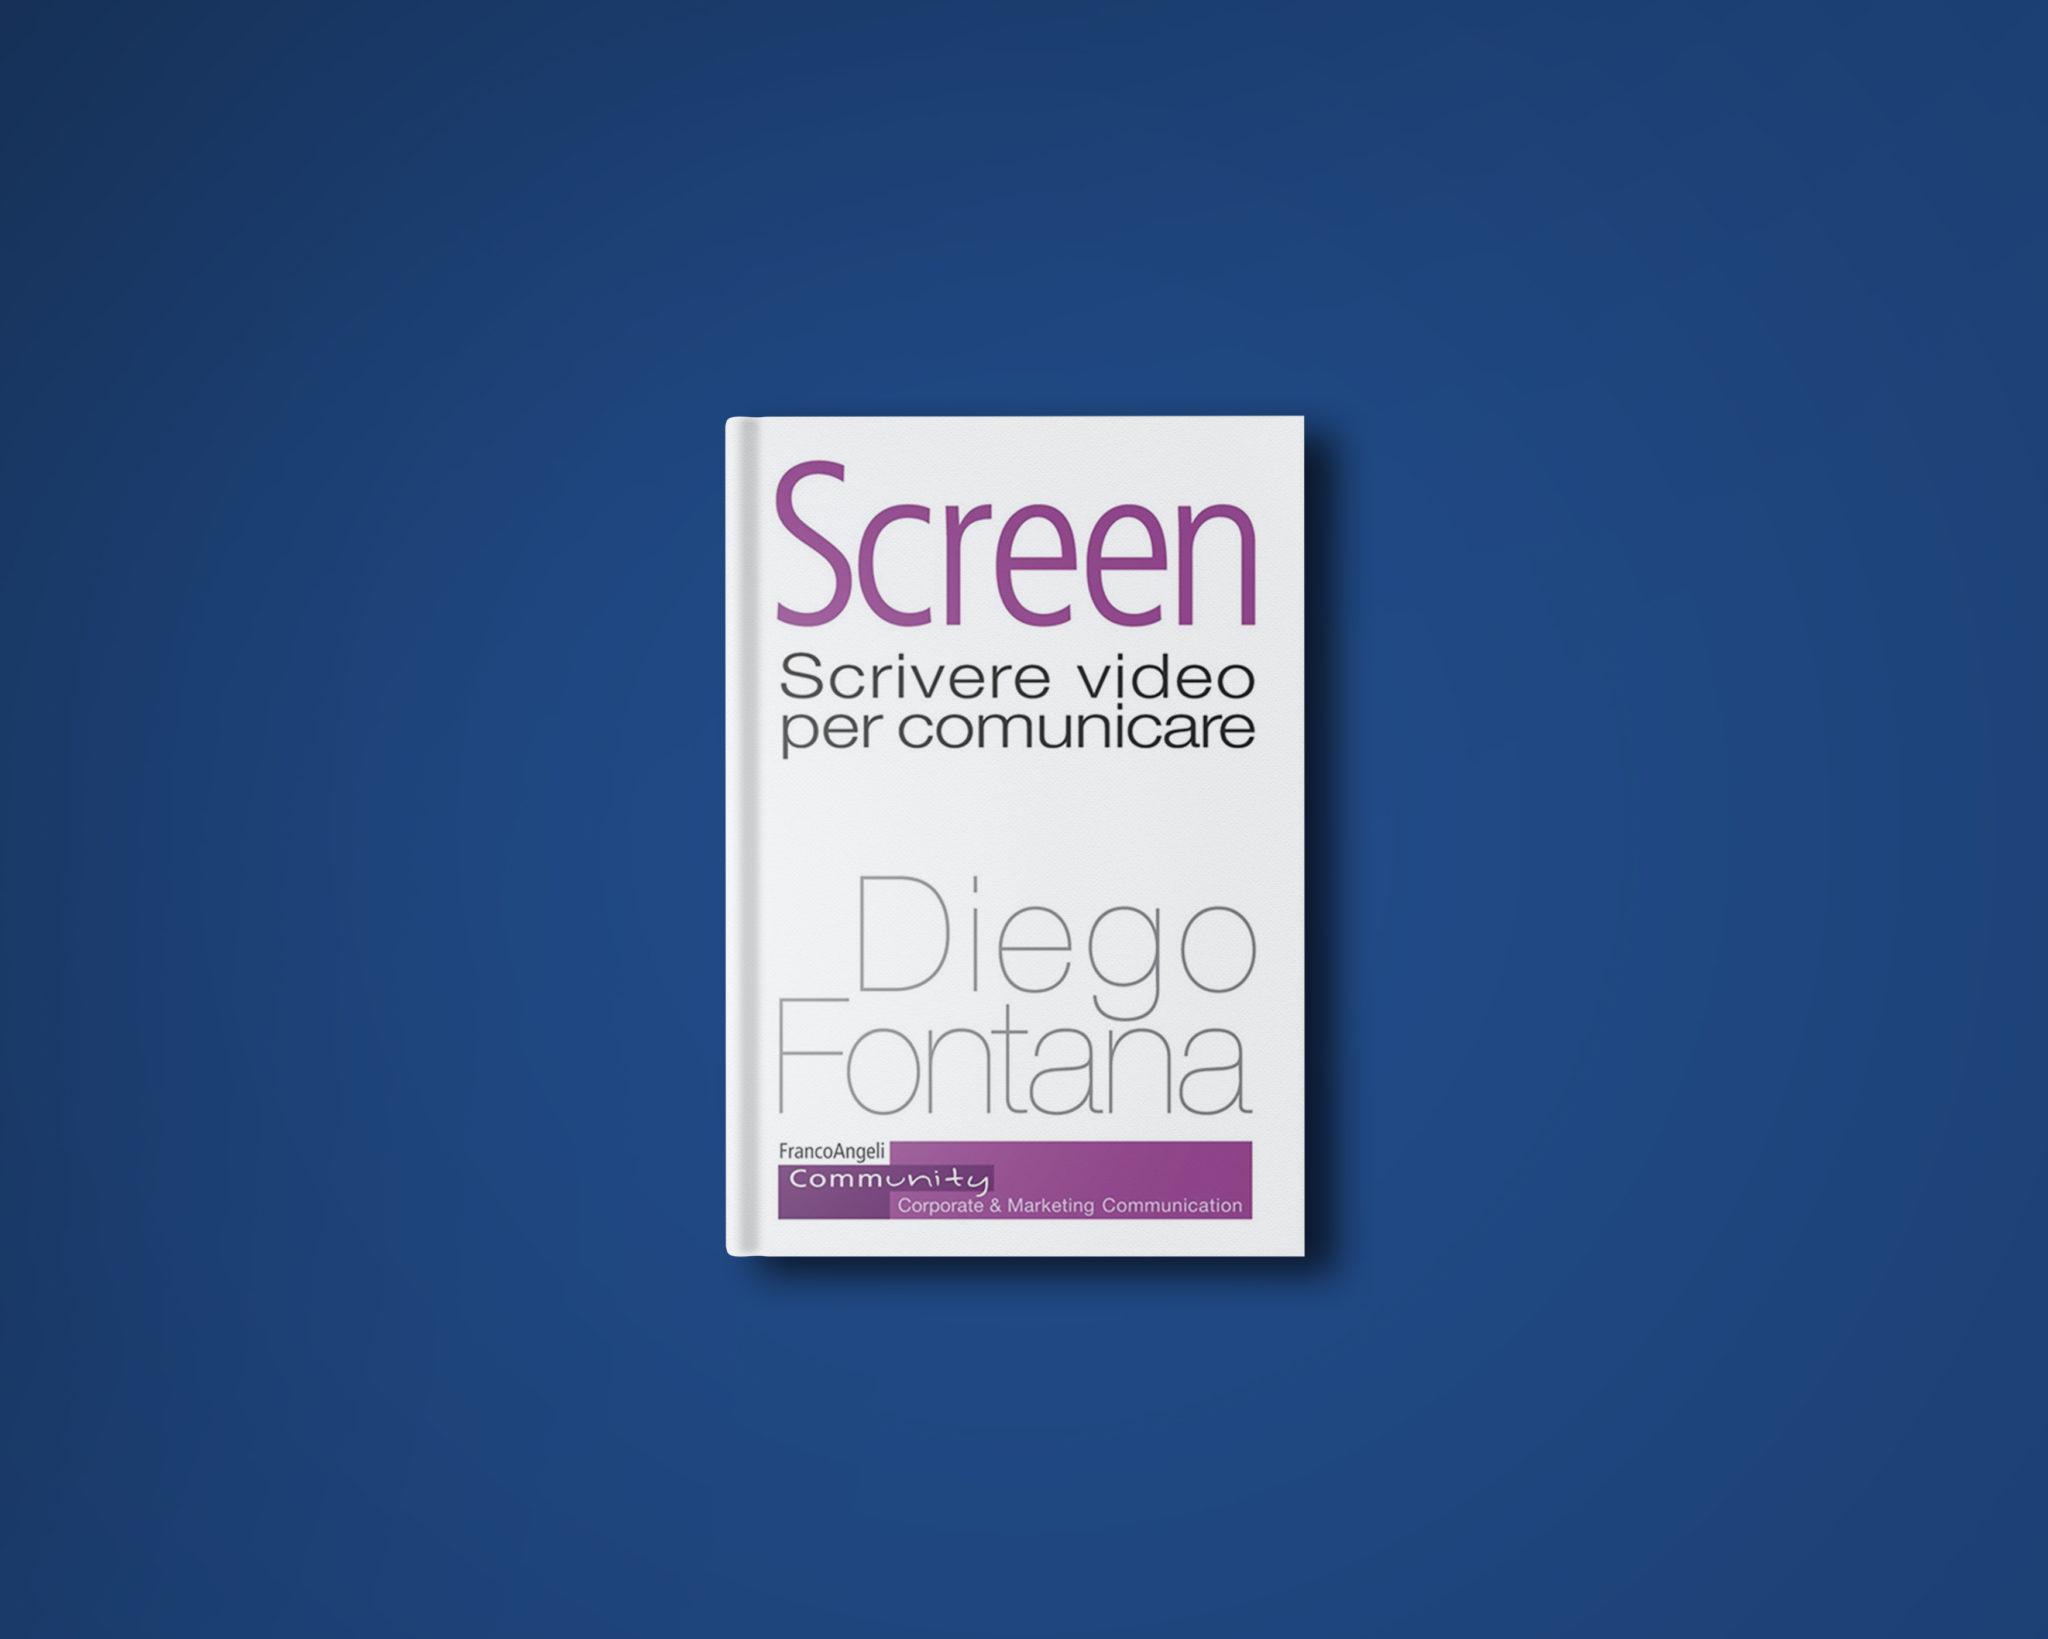 Screen – Scrivere video per comunicare di Diego Fontana